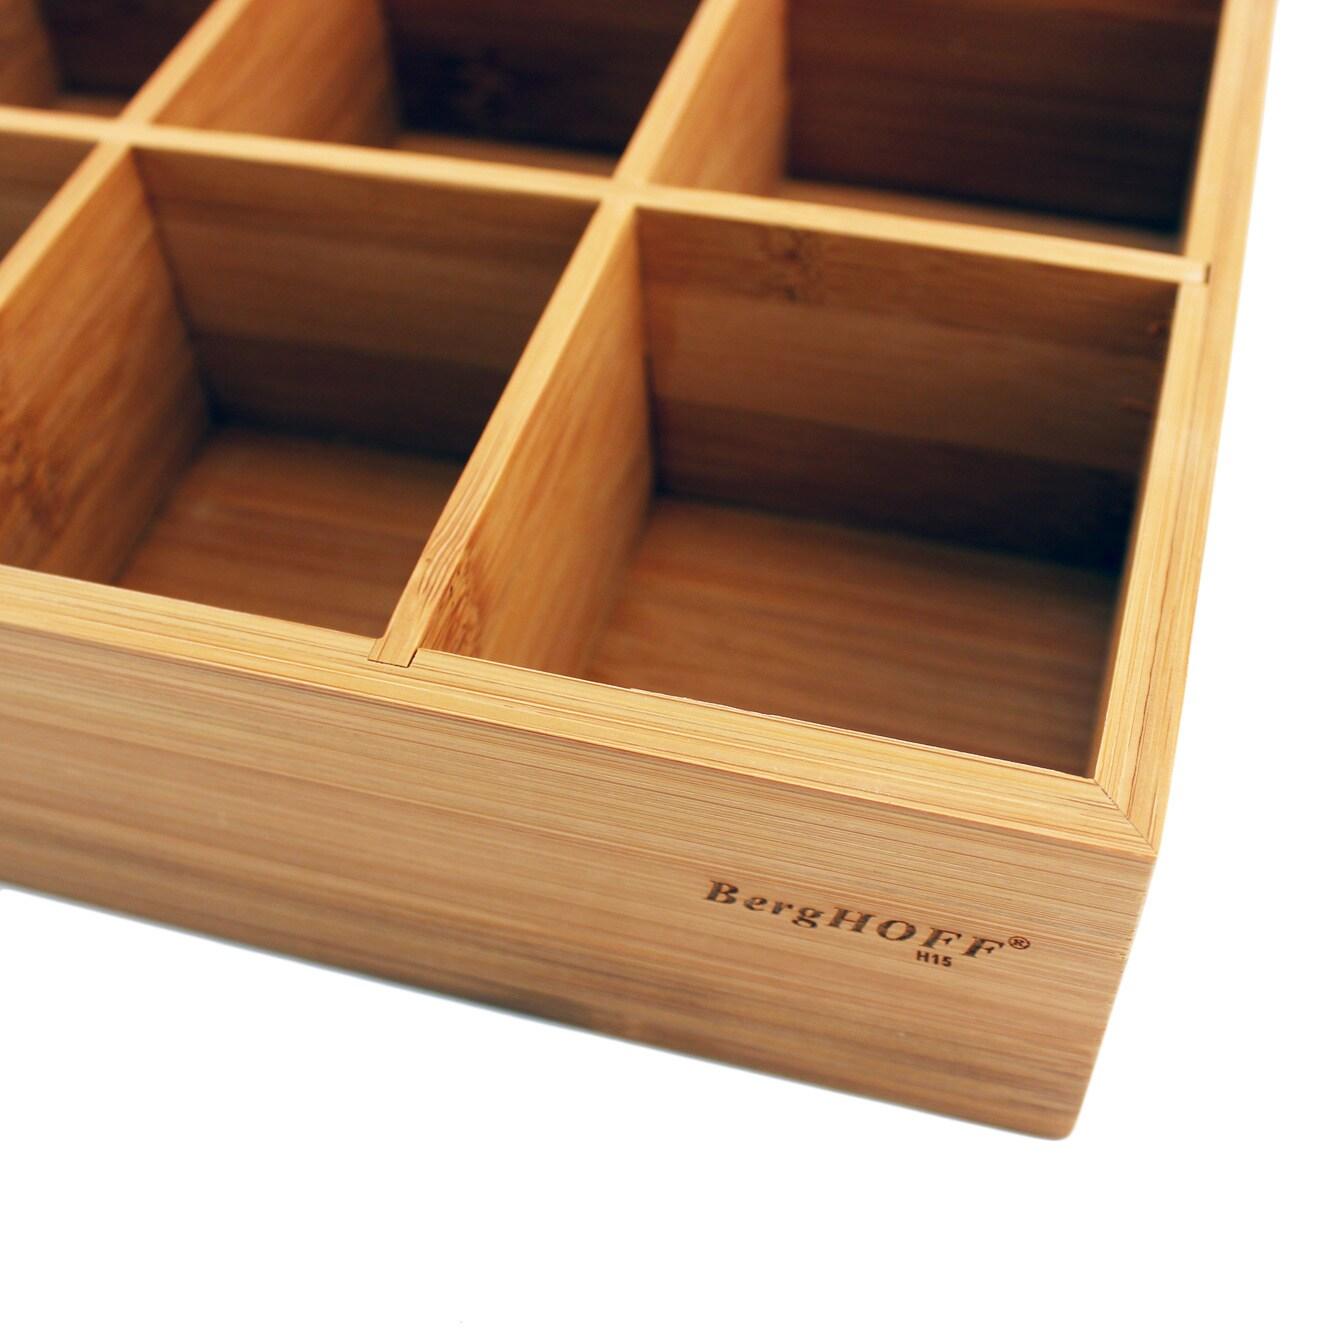 Berghoff Bamboo Tea Box Walmart Com Walmart Com